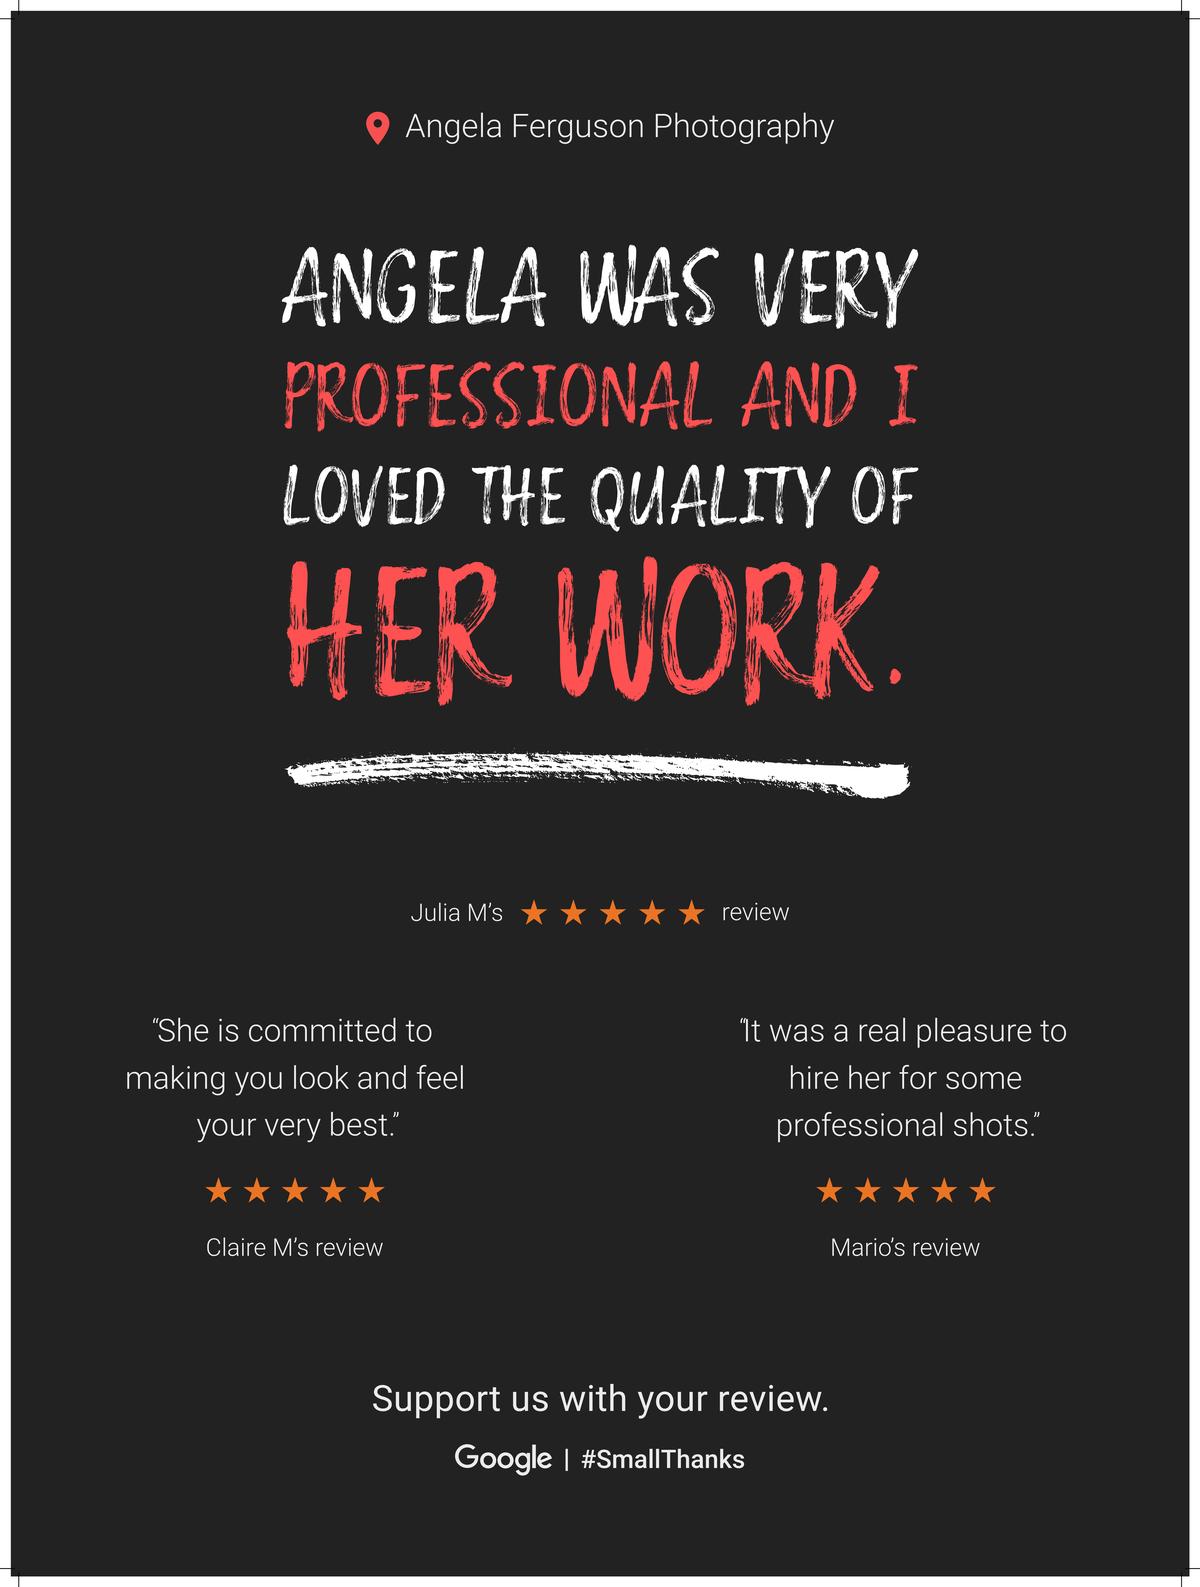 angela-ferguson-photography 400x600.png